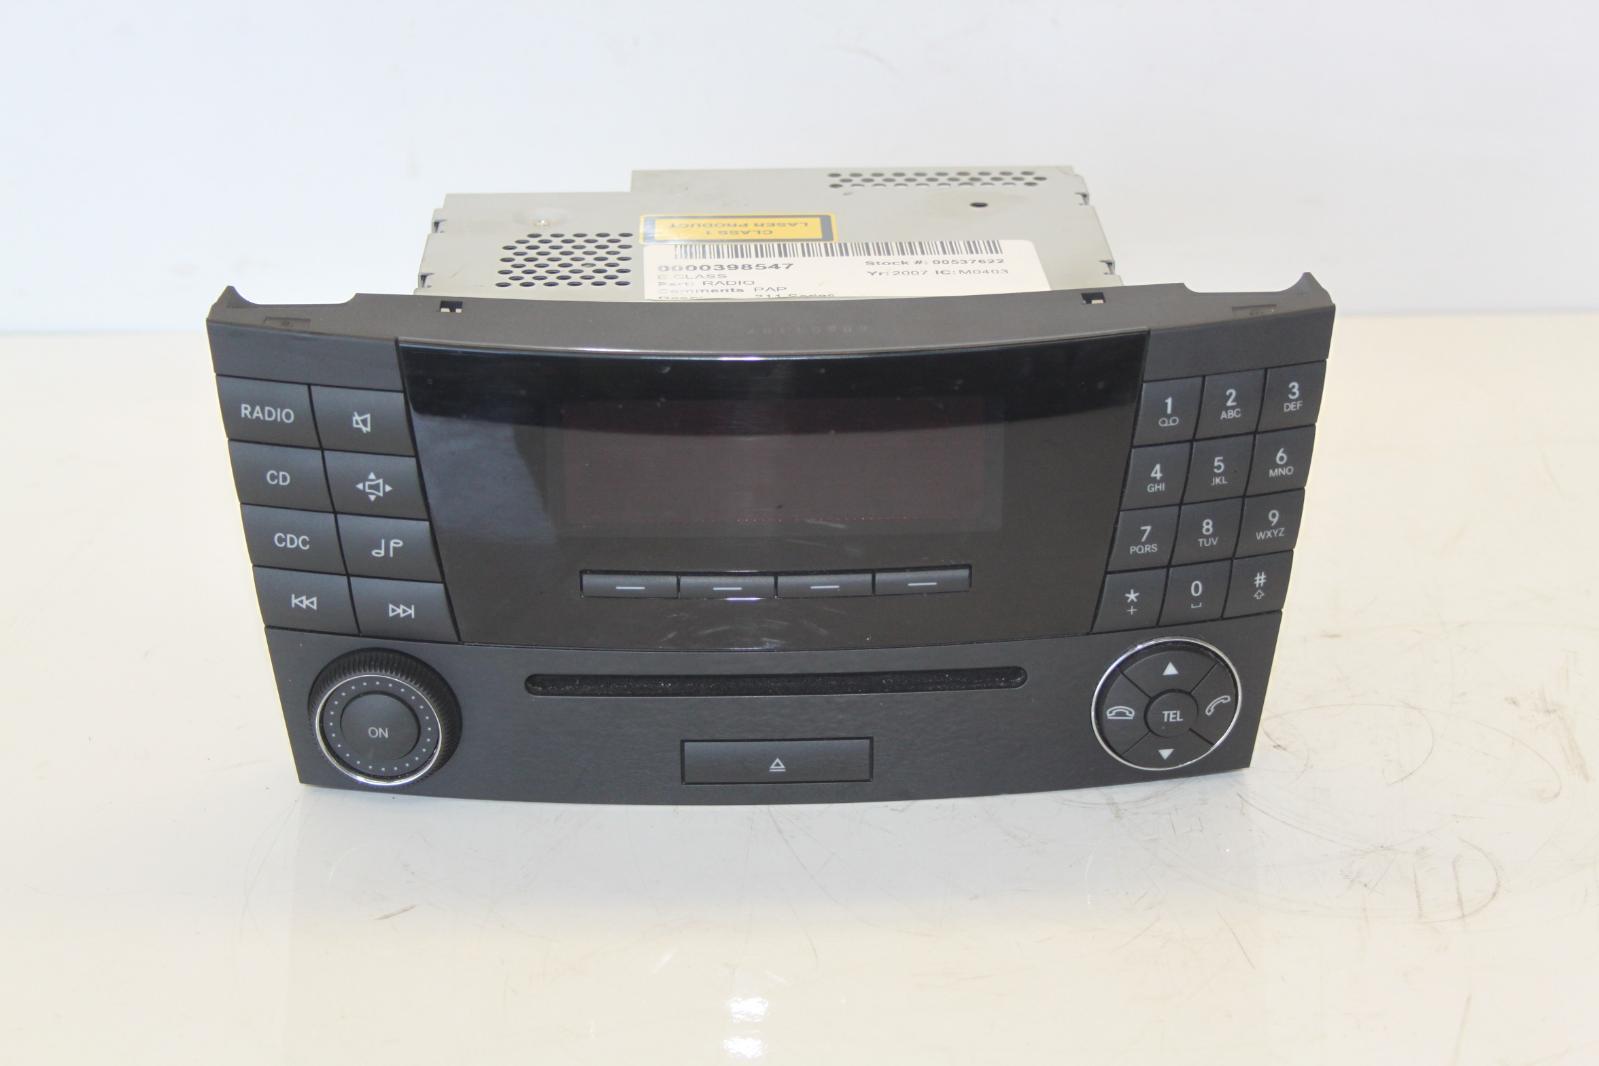 2007 w211 mercedes e class mf2770 stereo radio cd head. Black Bedroom Furniture Sets. Home Design Ideas